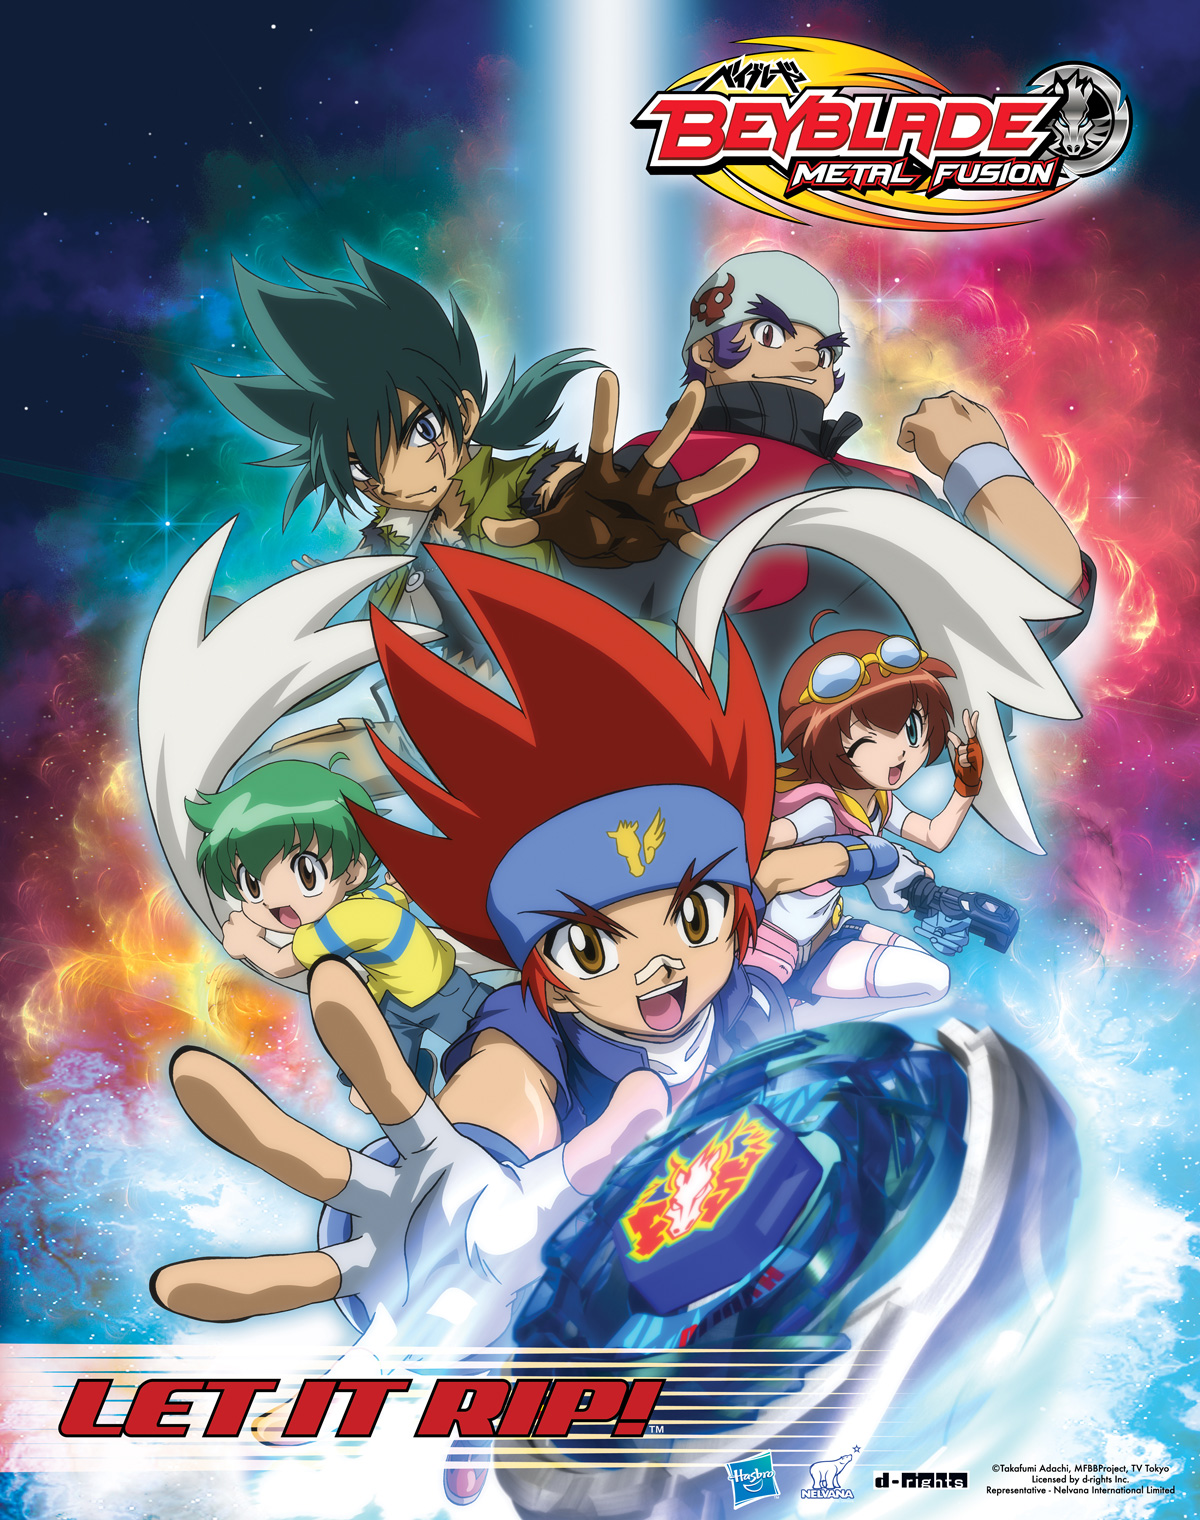 Download Uq Holder Sub Indo Batch : download, holder, batch, Anime, Orange, Batch, Google, Drive